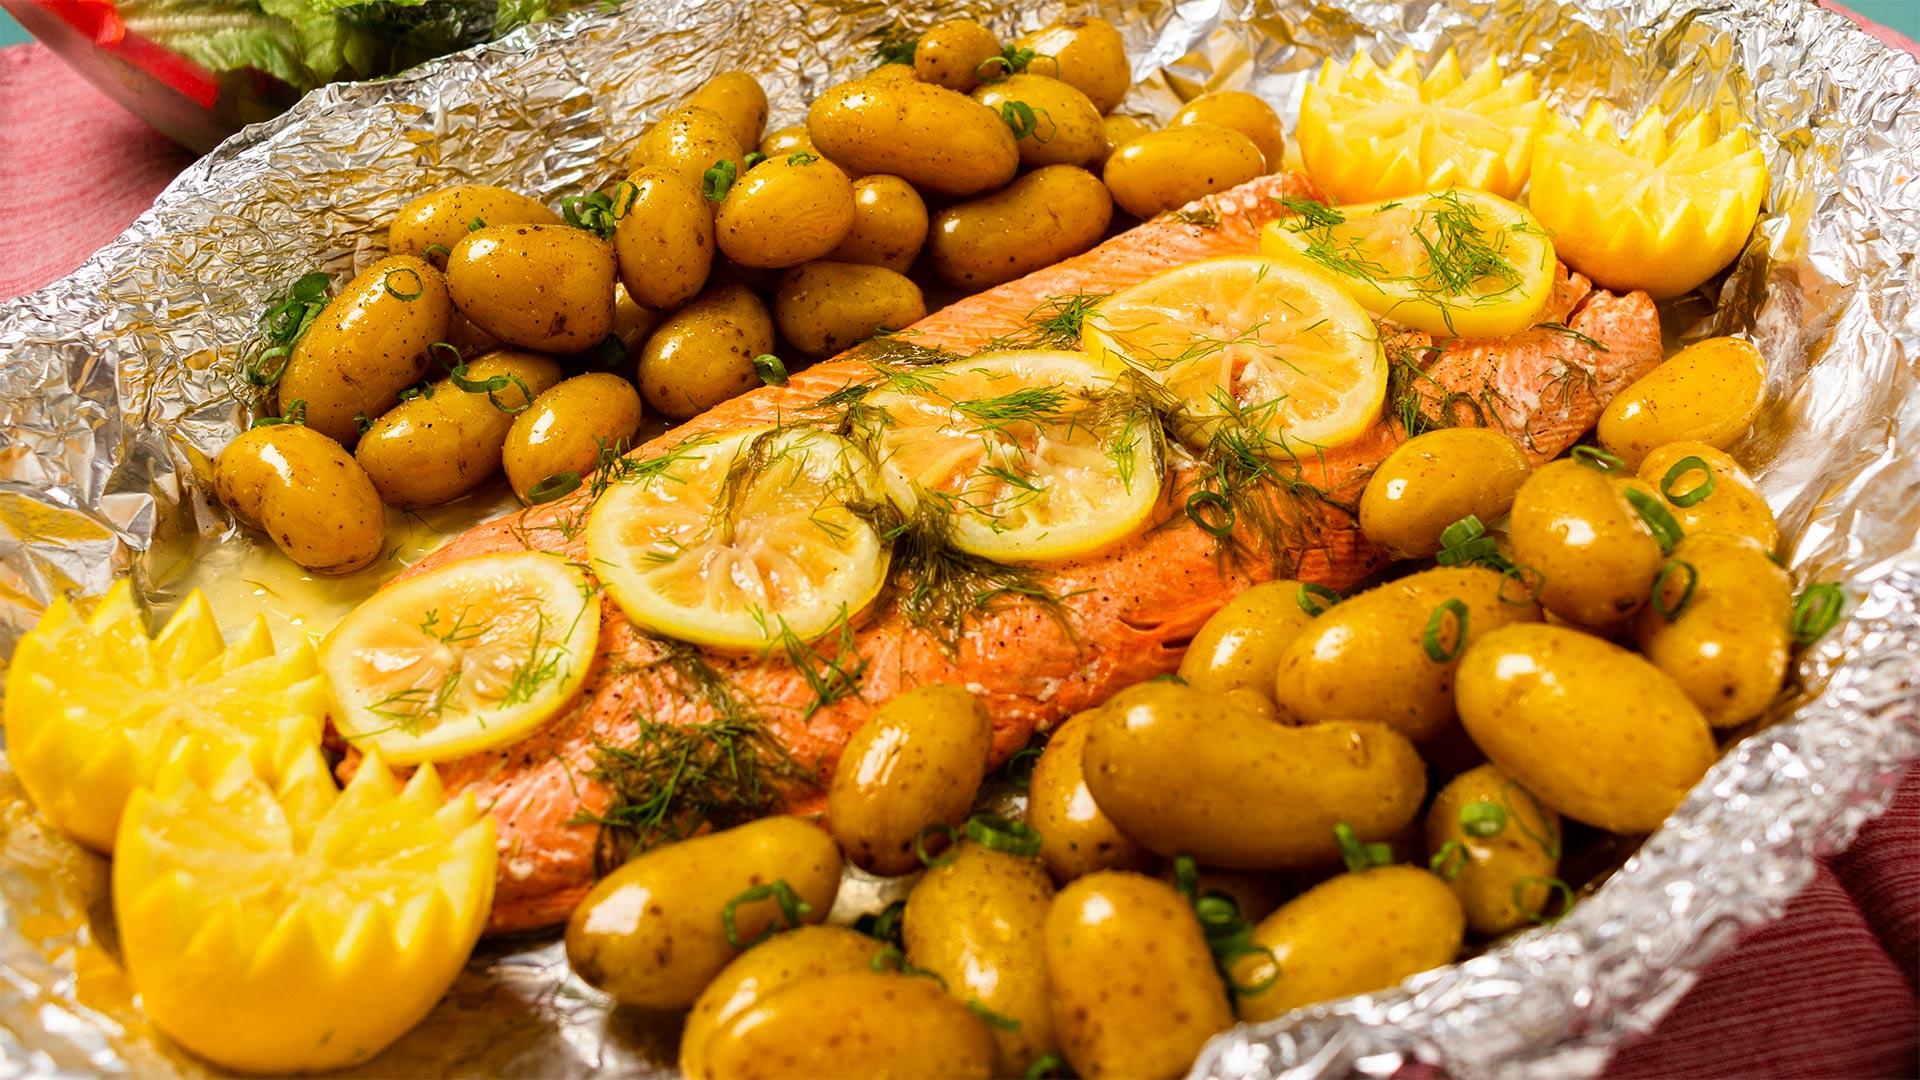 pbs 6 plus food over 50 salmon hero